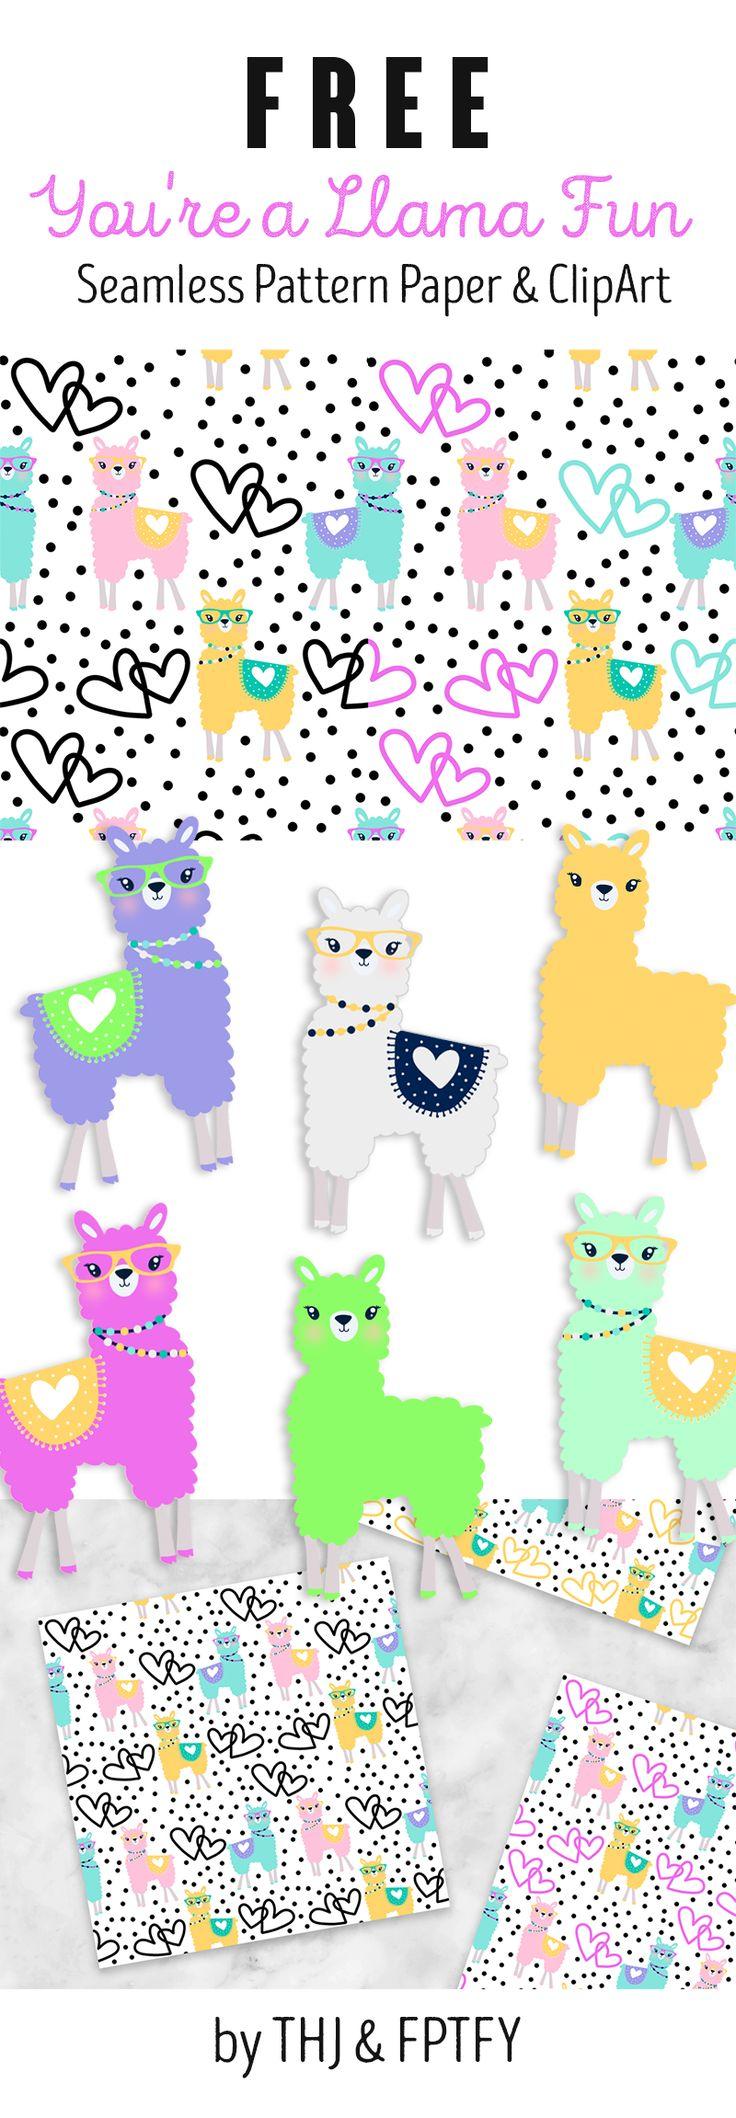 You're a Llama fun Freebie Collection!